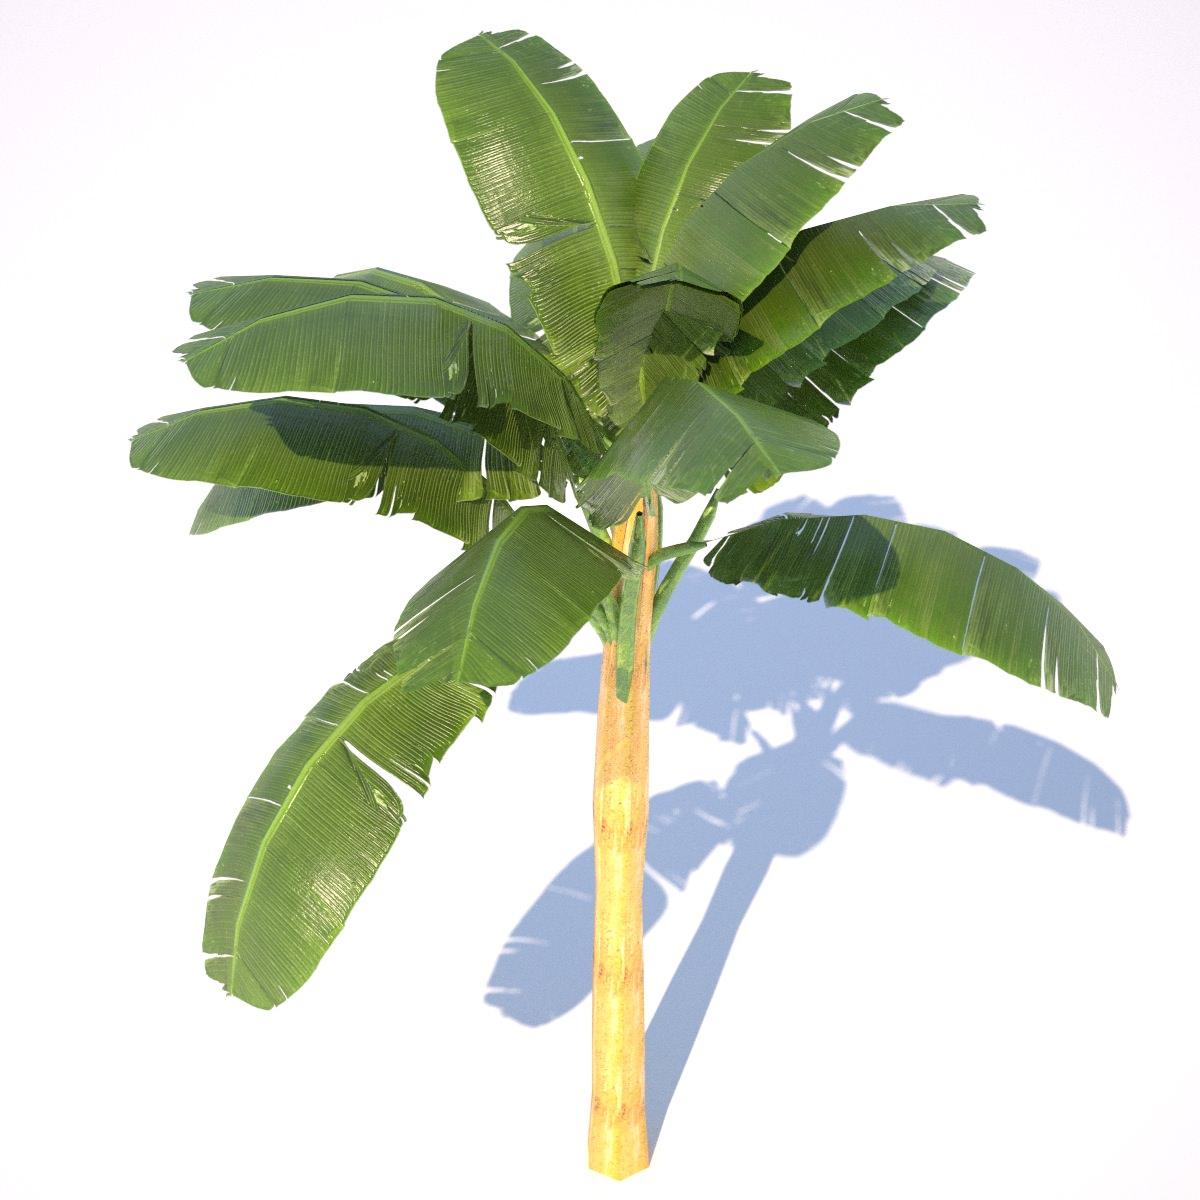 Tropical Banana Leaves Tapestry Juicy Tropical Banana Leaf Png